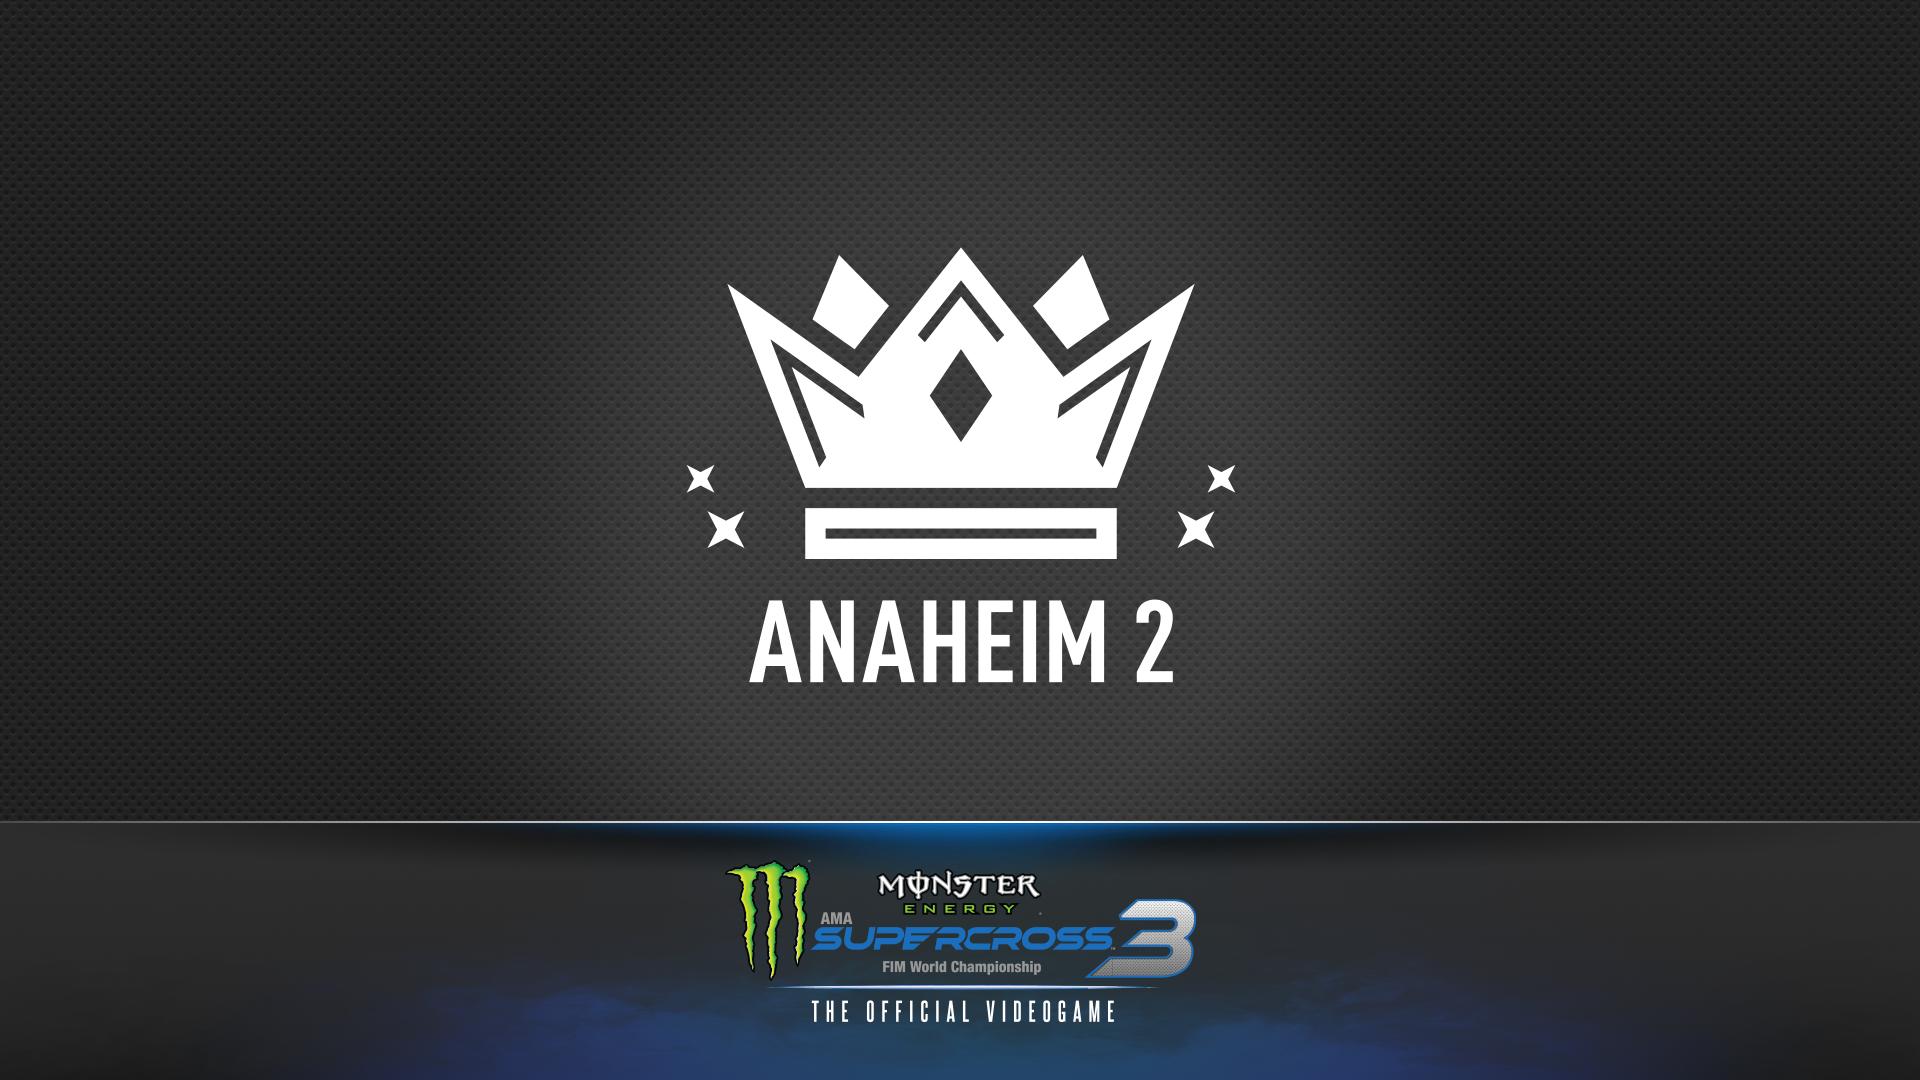 King of Anaheim 2